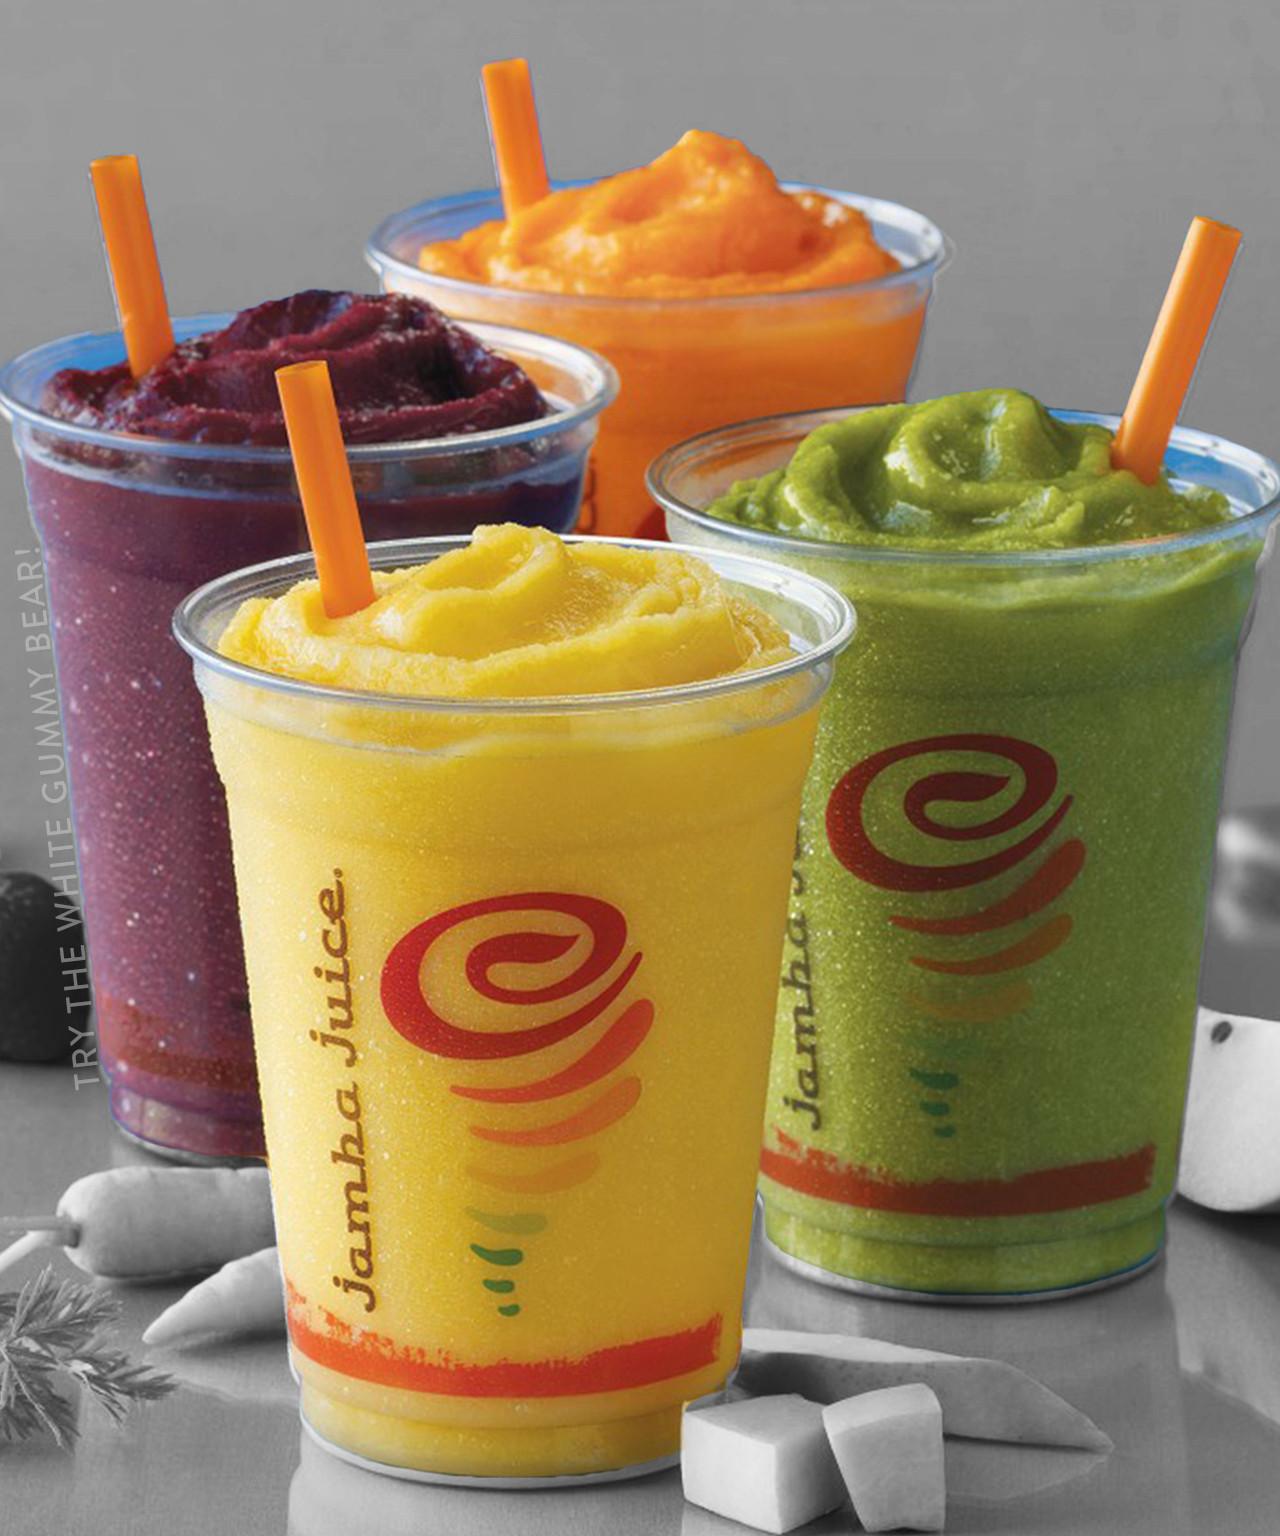 Are Jamba Juice Smoothies Healthy  Secret Menus Jamba Juice s Hidden Smoothies